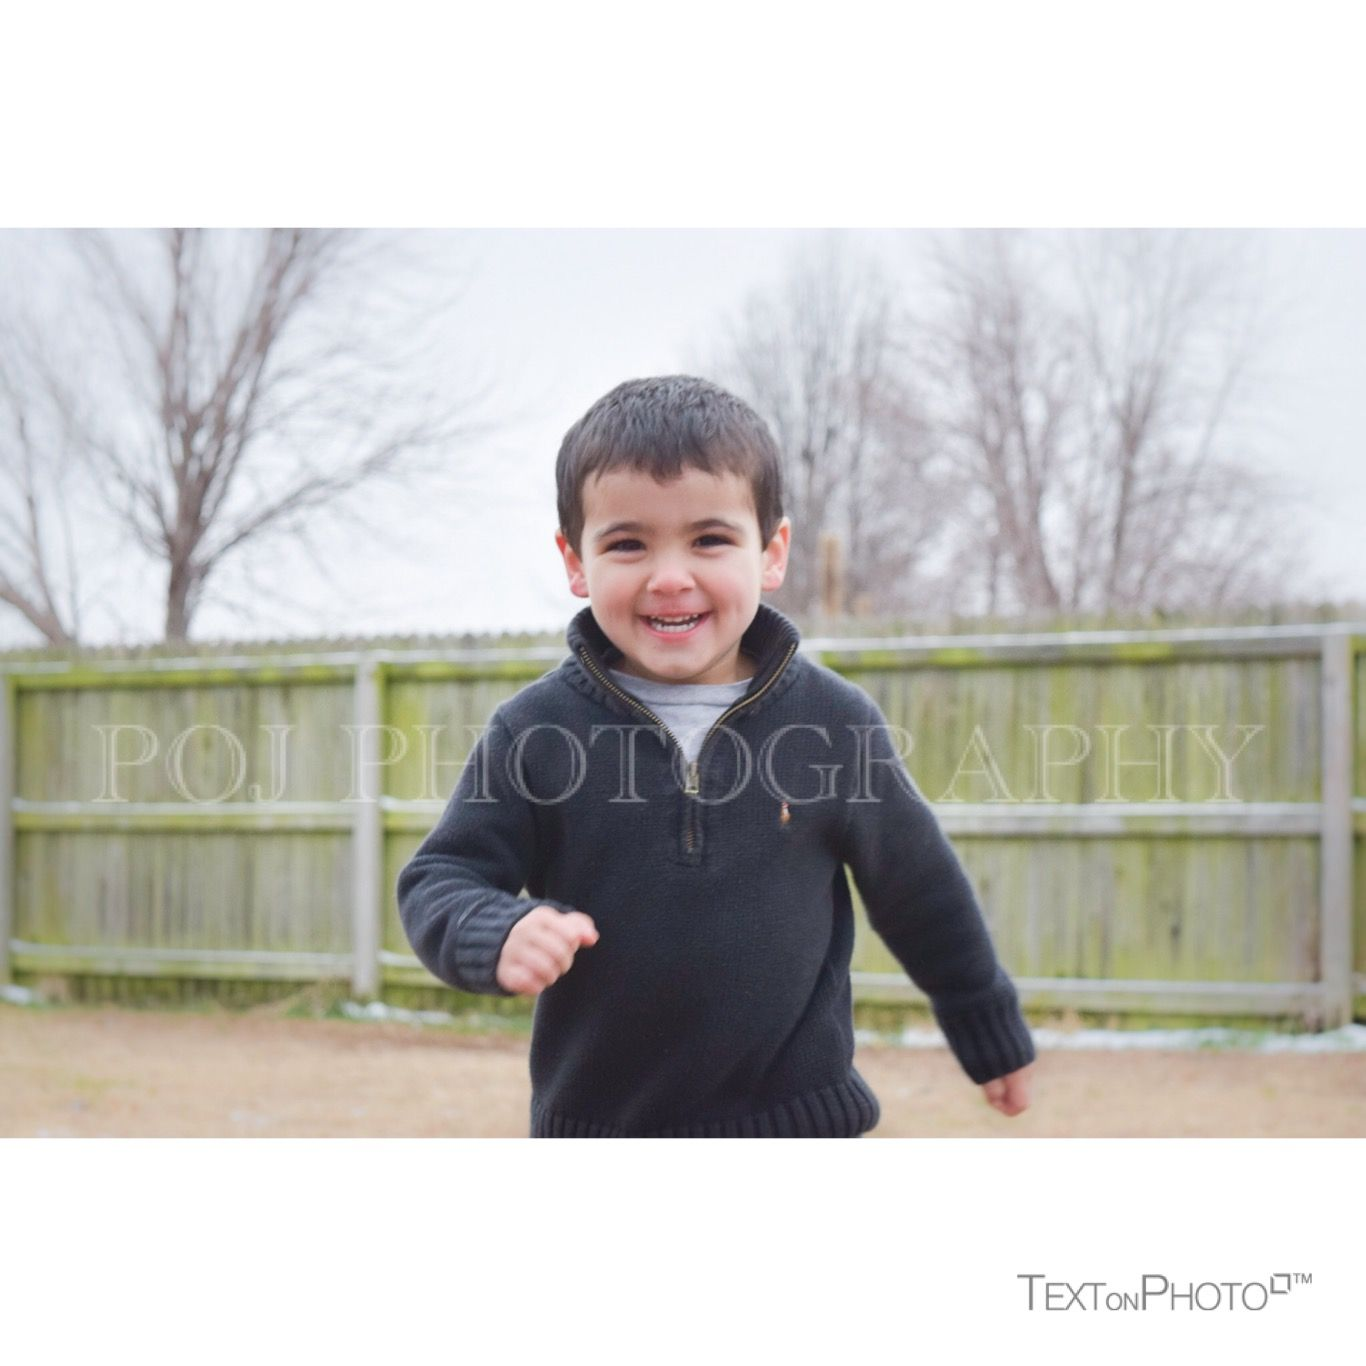 Children's photography, boy, outdoor